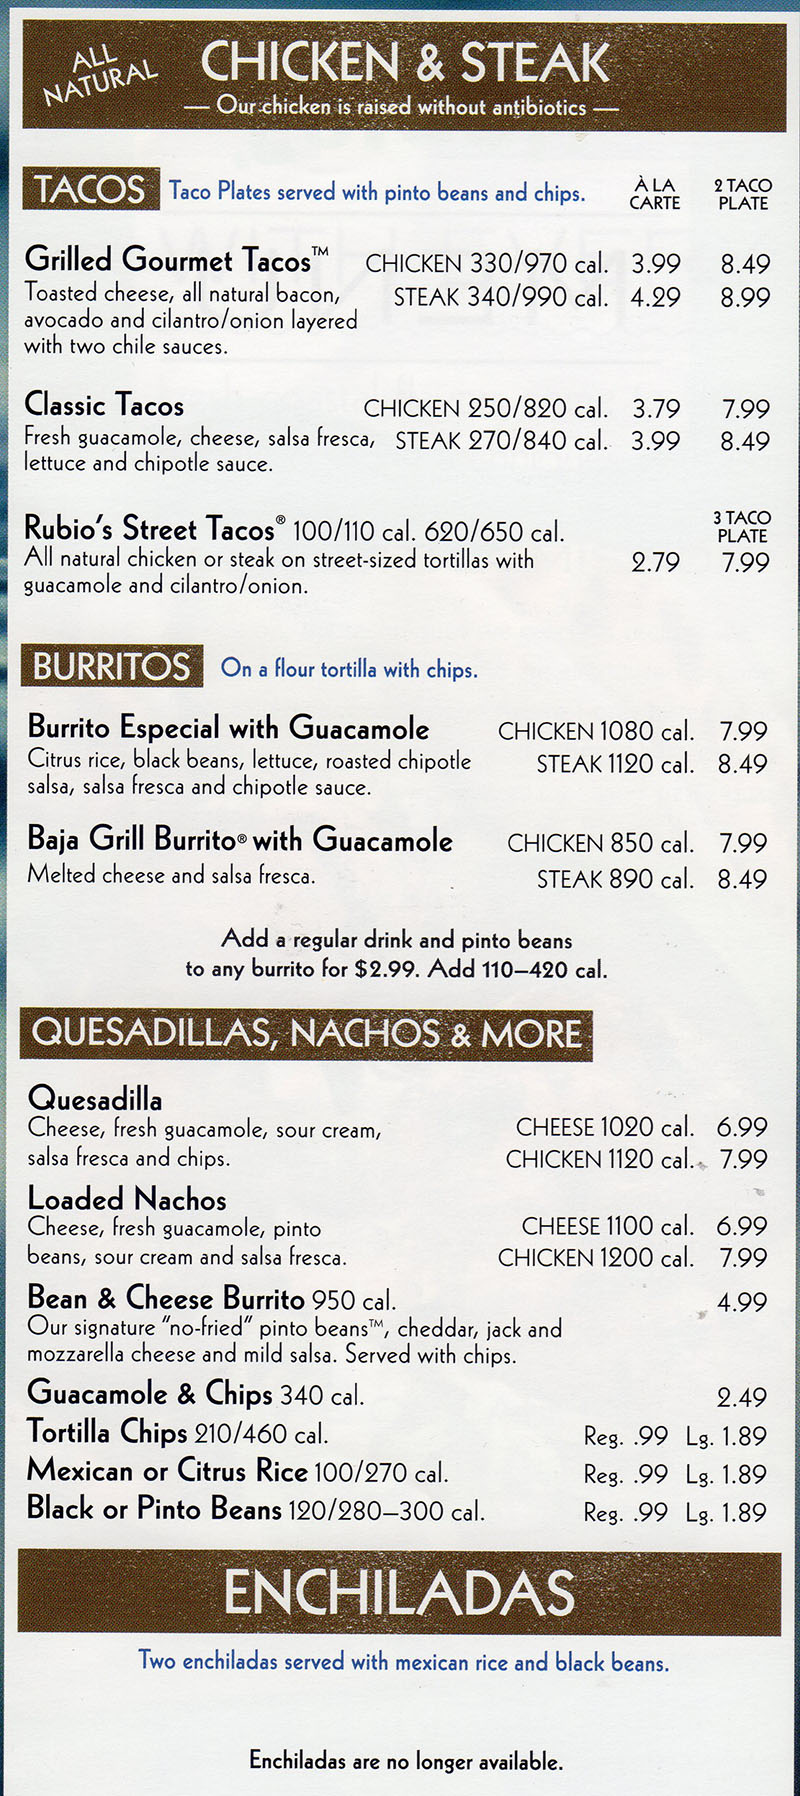 Rubio's menu - chicken and steak, burritos, quesadillas, nachos and more